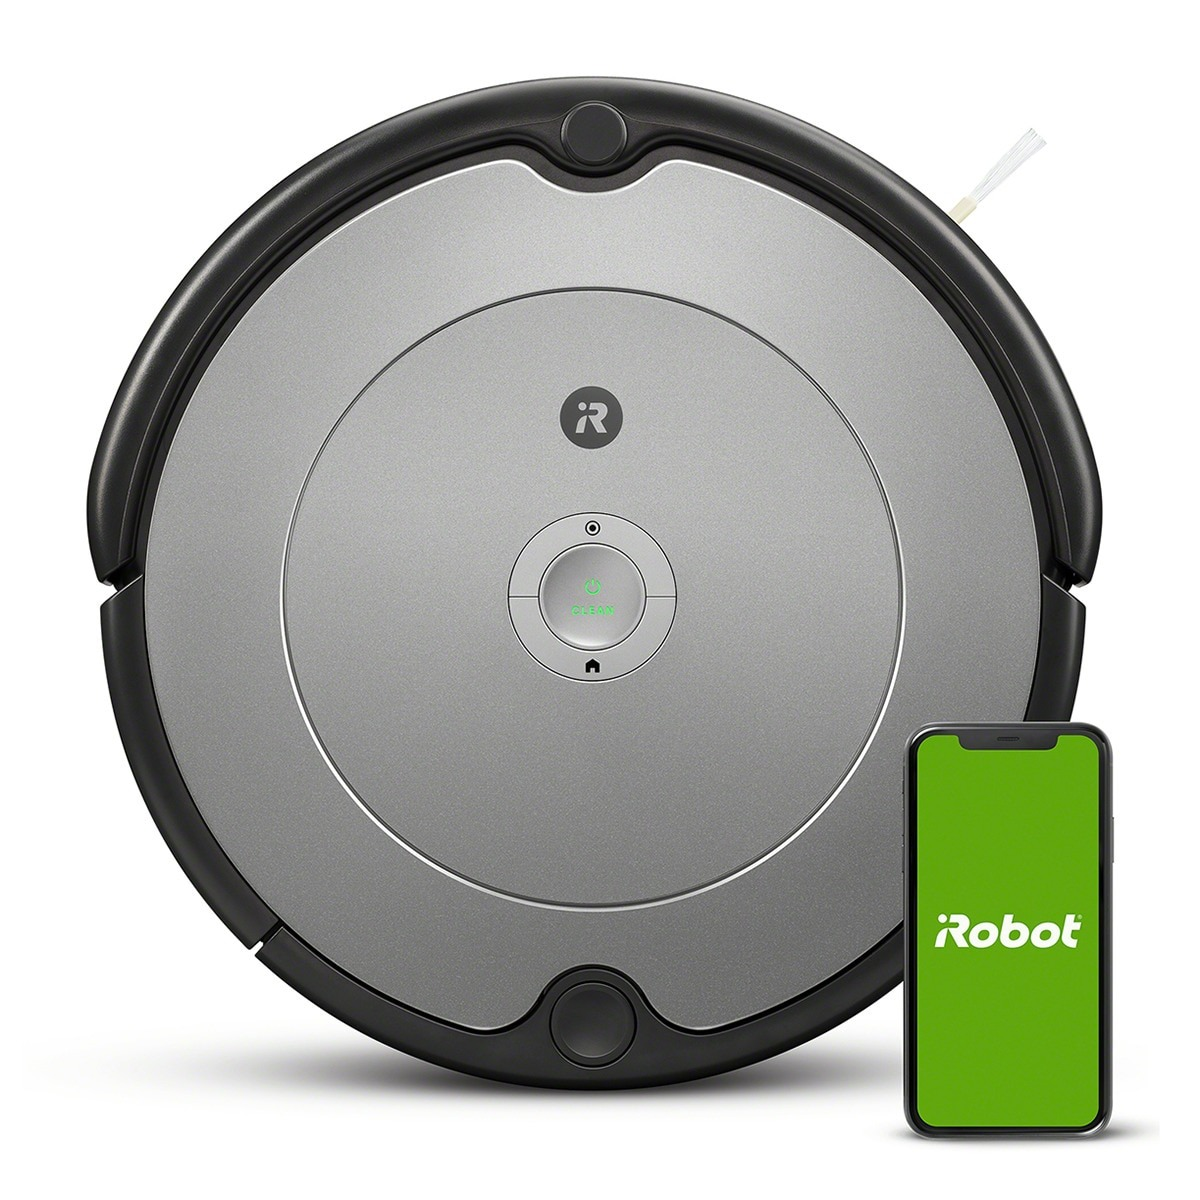 IROBOT Robot aspirador iRobot Roomba 694